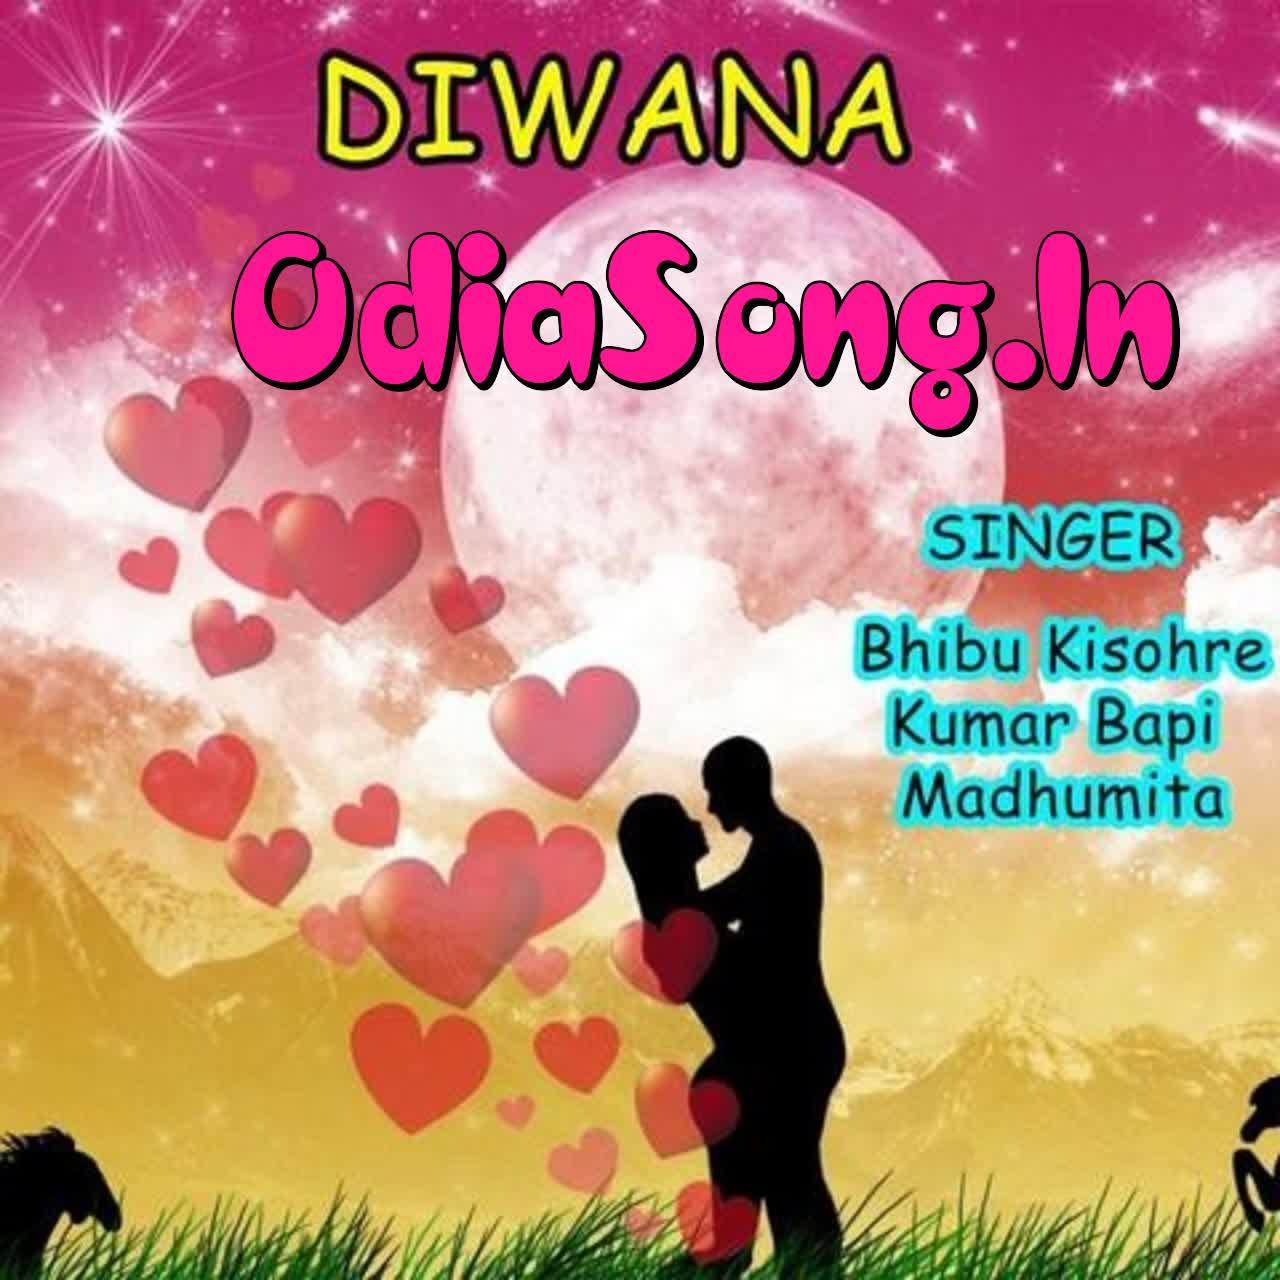 Diwana (Bibhu Kishore)